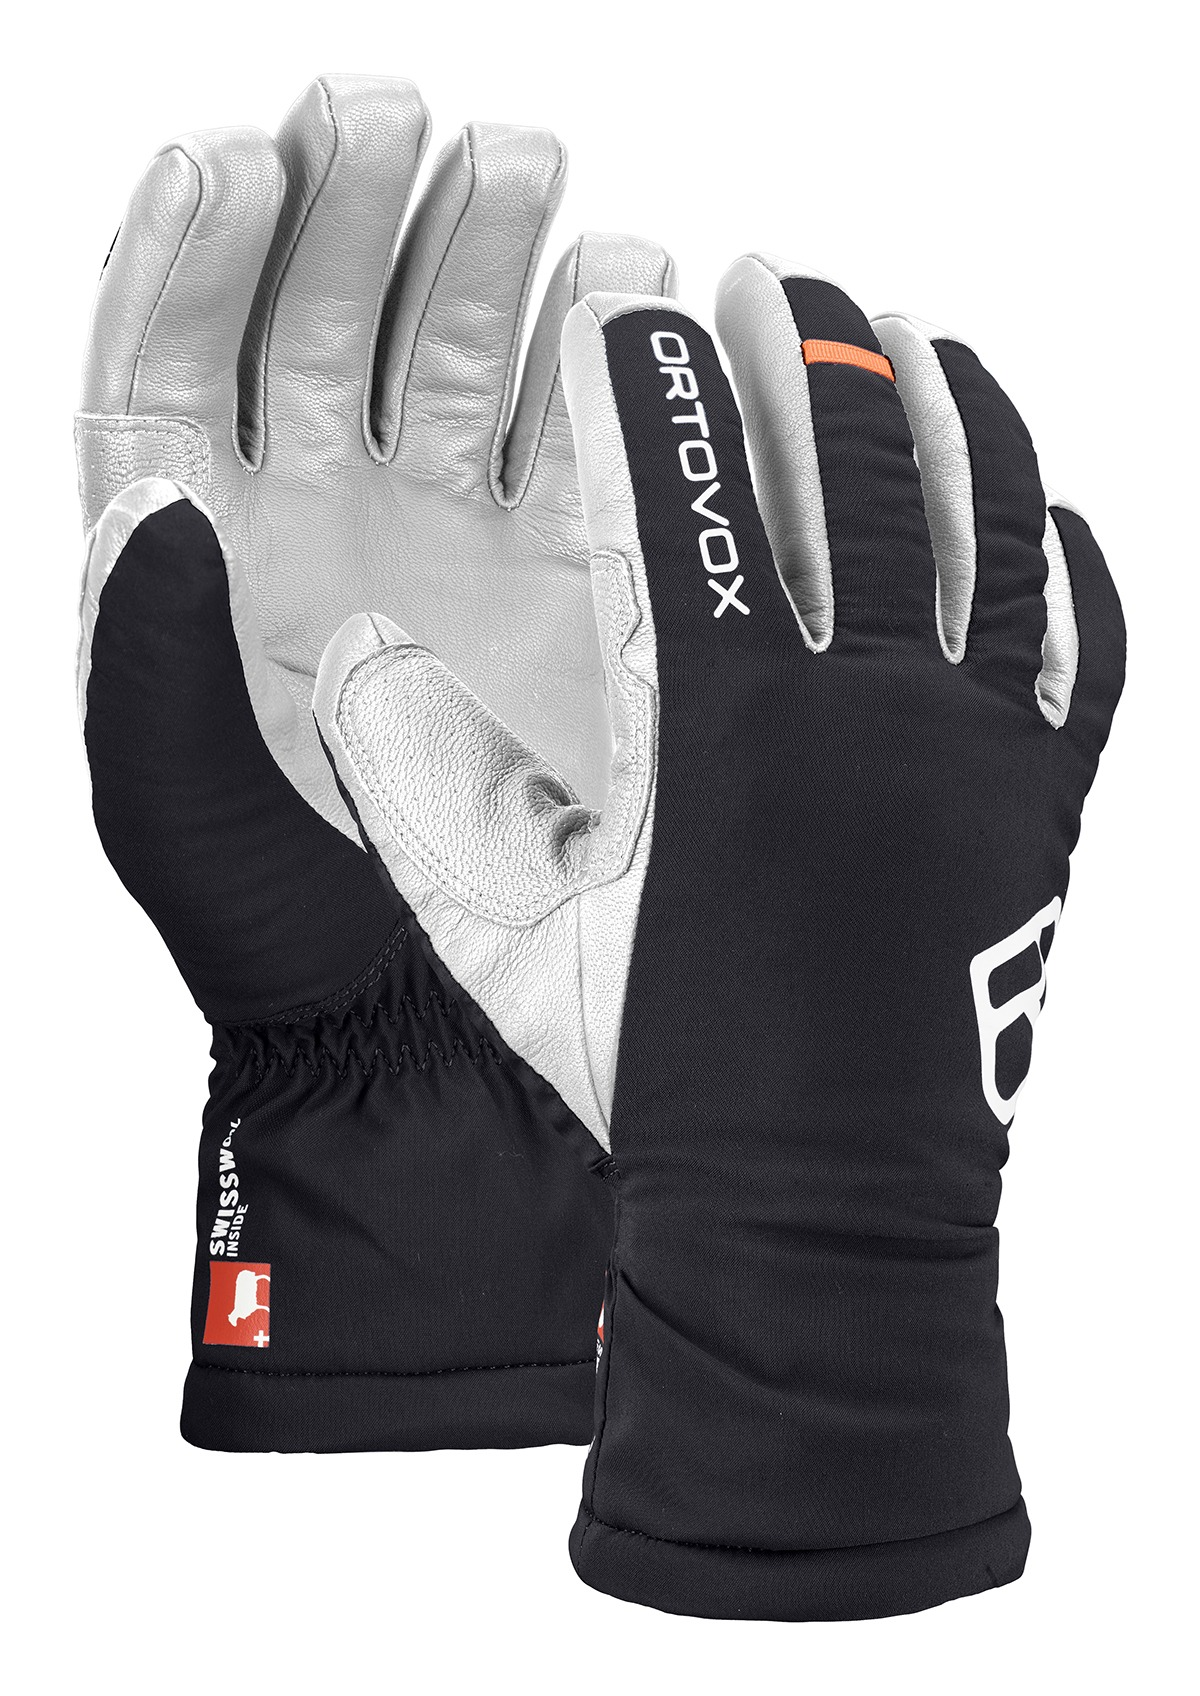 Ortovox Men's Swisswool Freeride Glove - Black Raven